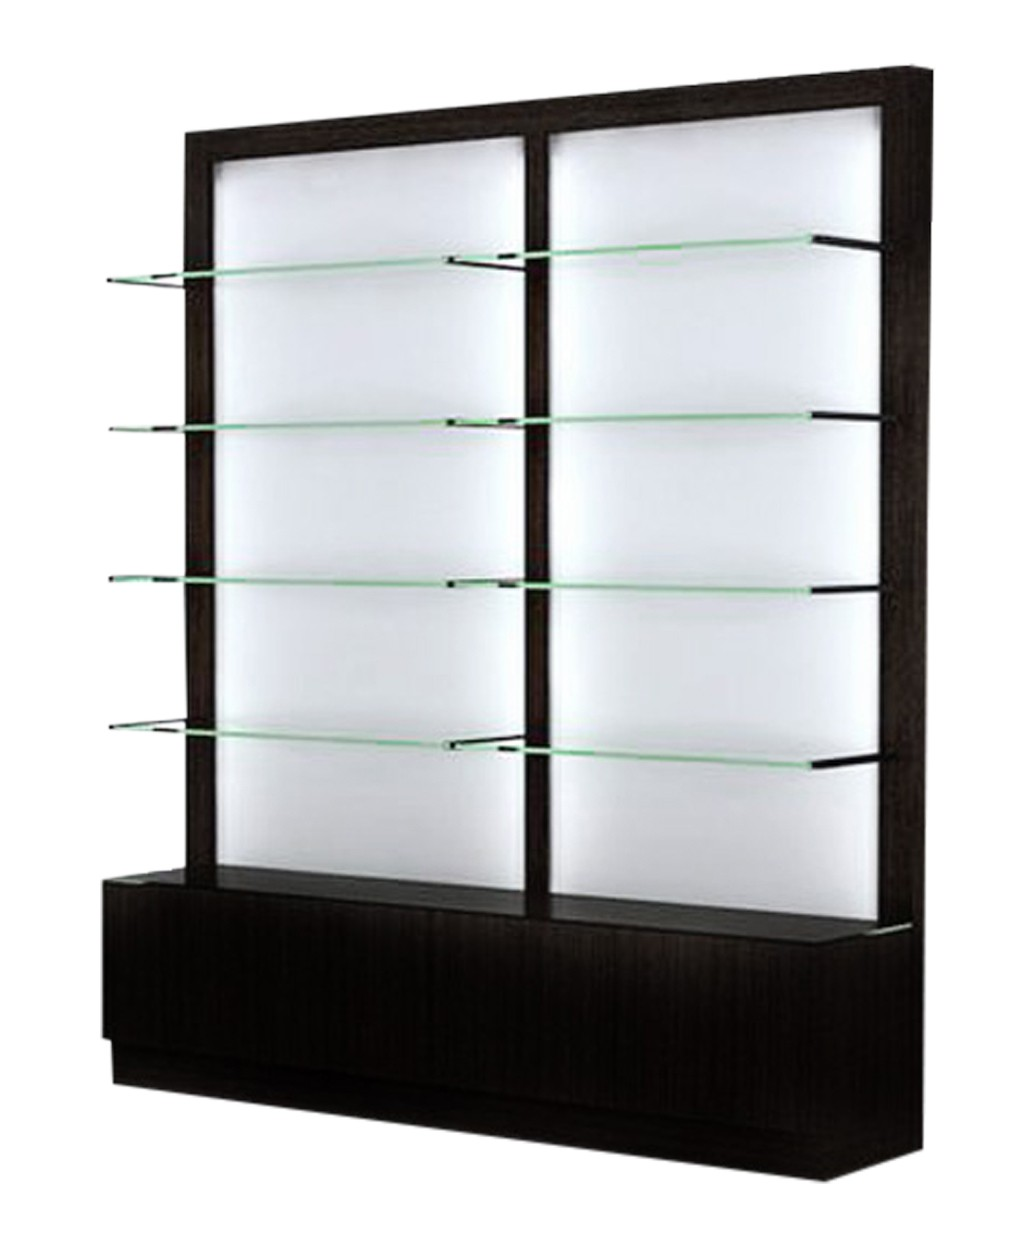 Collins 6650 Zada Backlit Retail Display w/ LED Lights